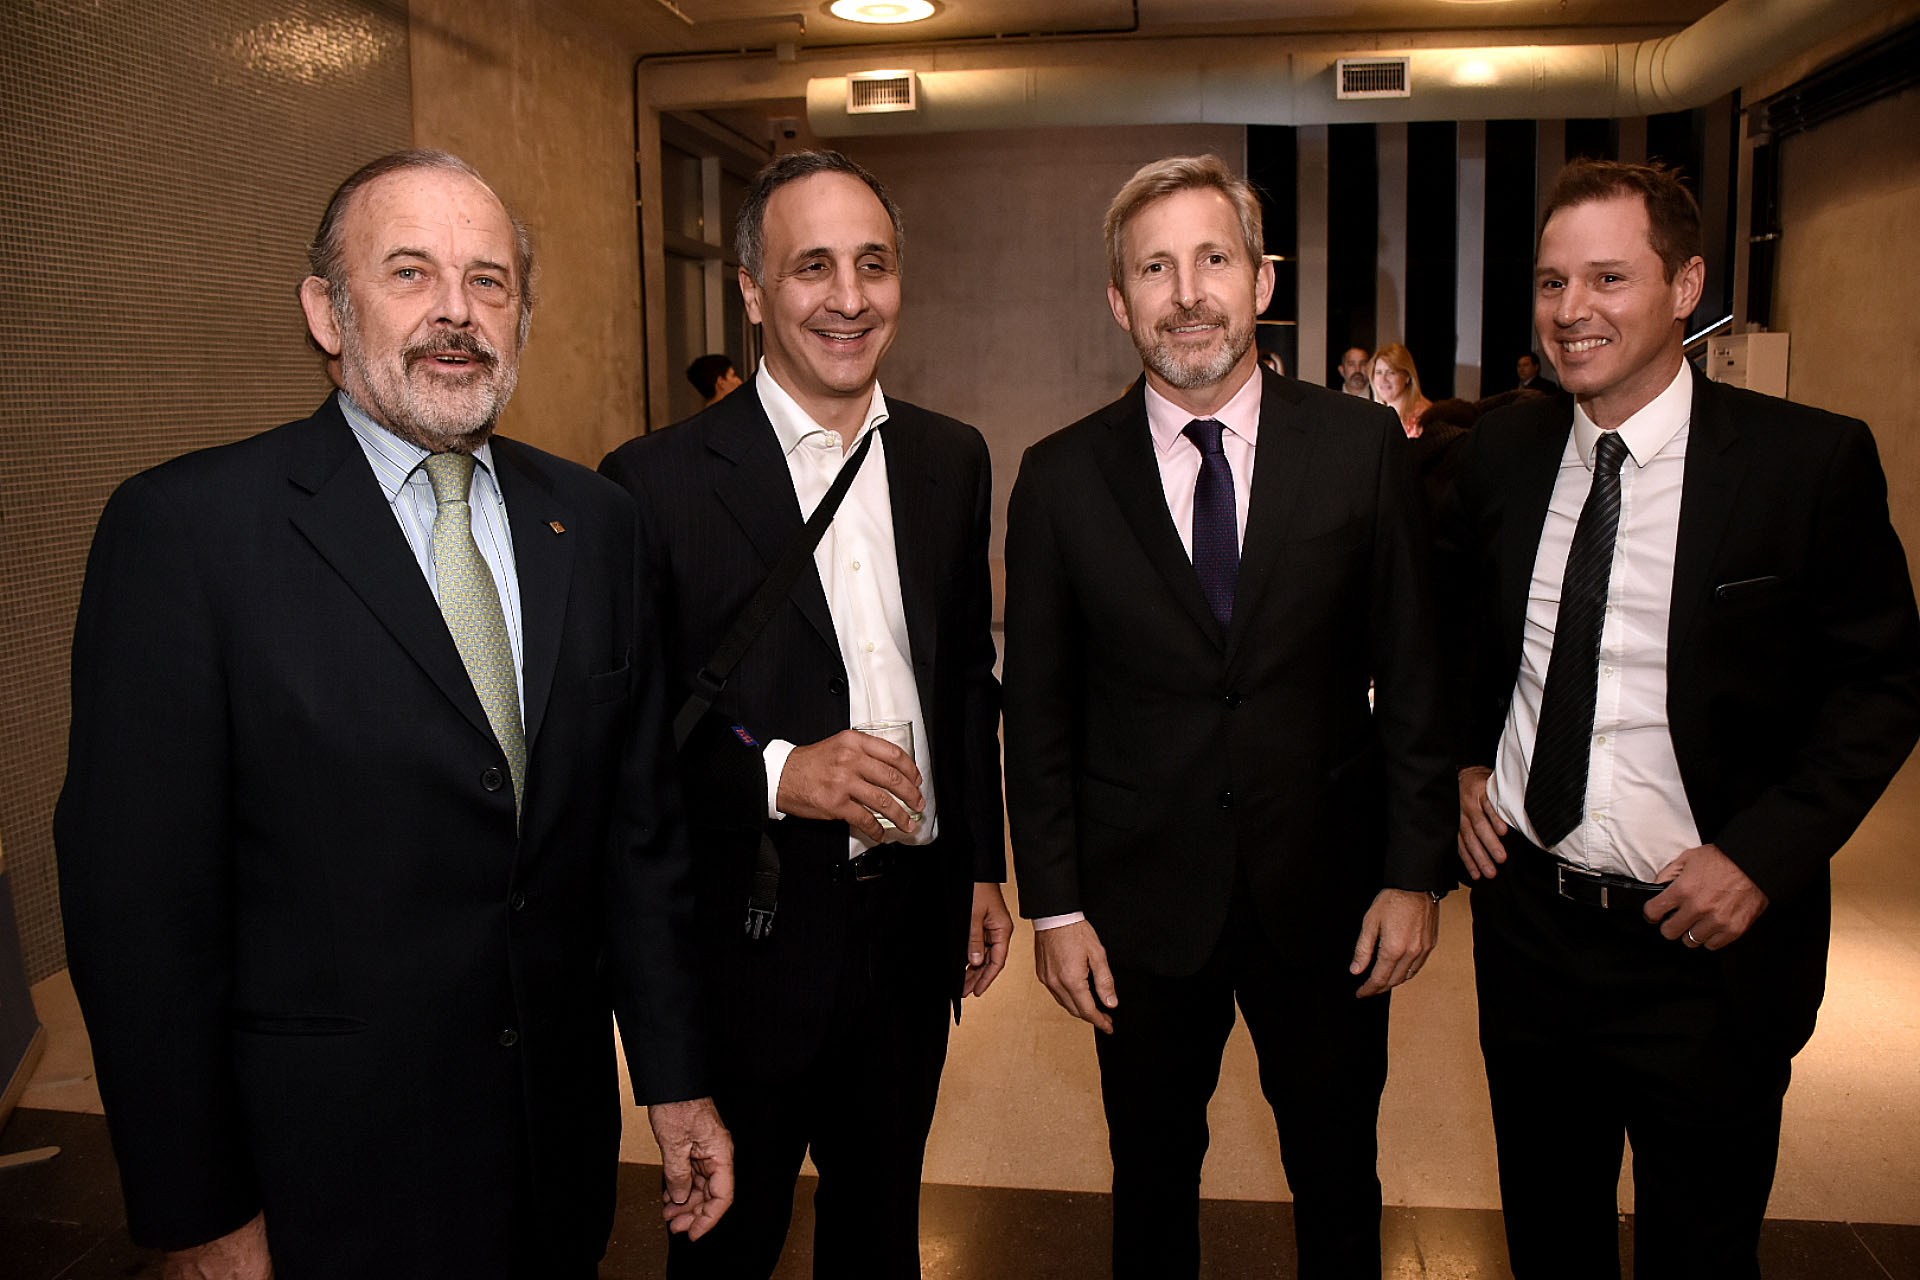 Eduardo Amadeo, Marcos Bulgheroni, Rogelio Frigerio y Jorge Brito